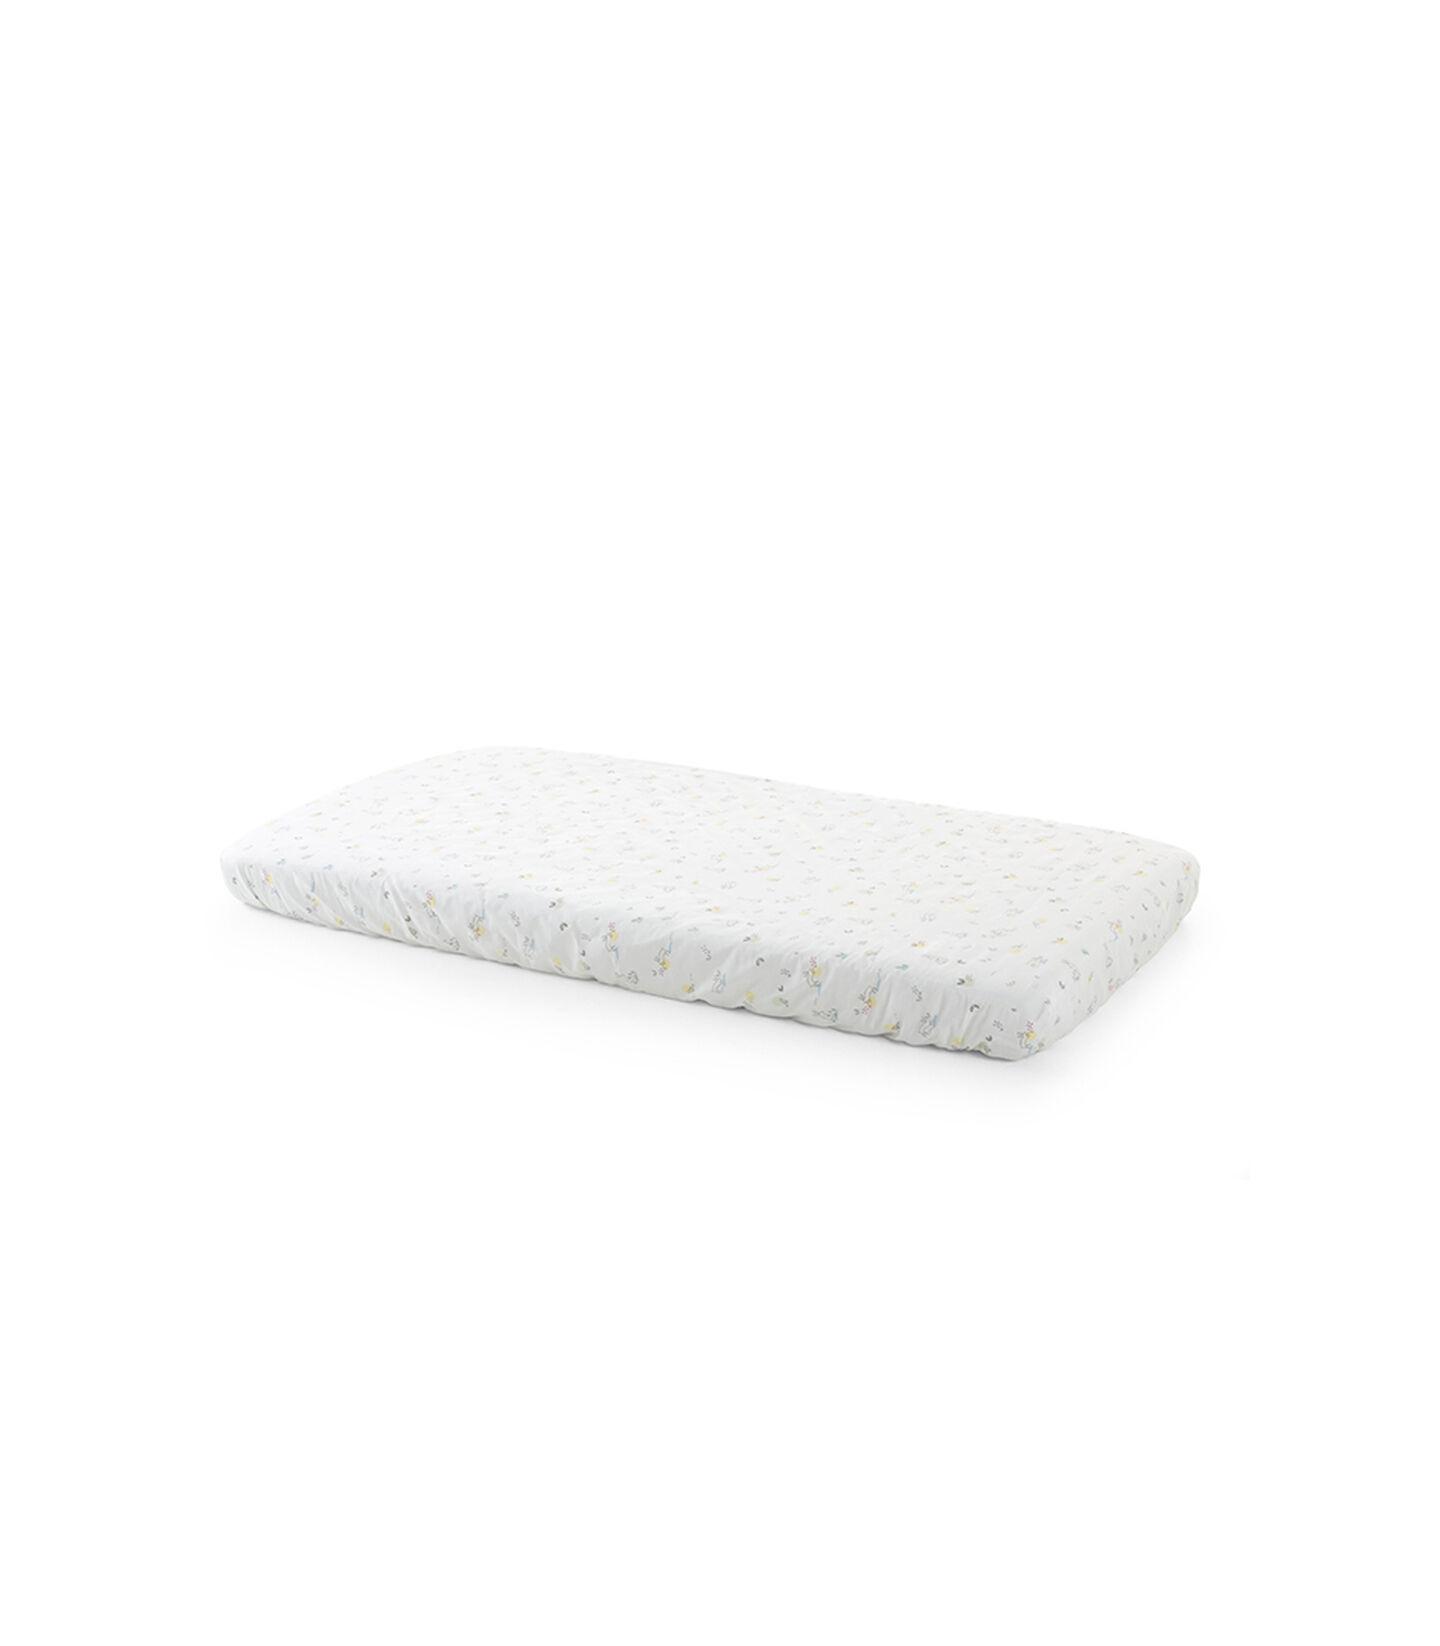 Stokke® Home™ Formsyet lagen til seng 2 stk. - Soft Rabbit, Soft Rabbit, mainview view 1